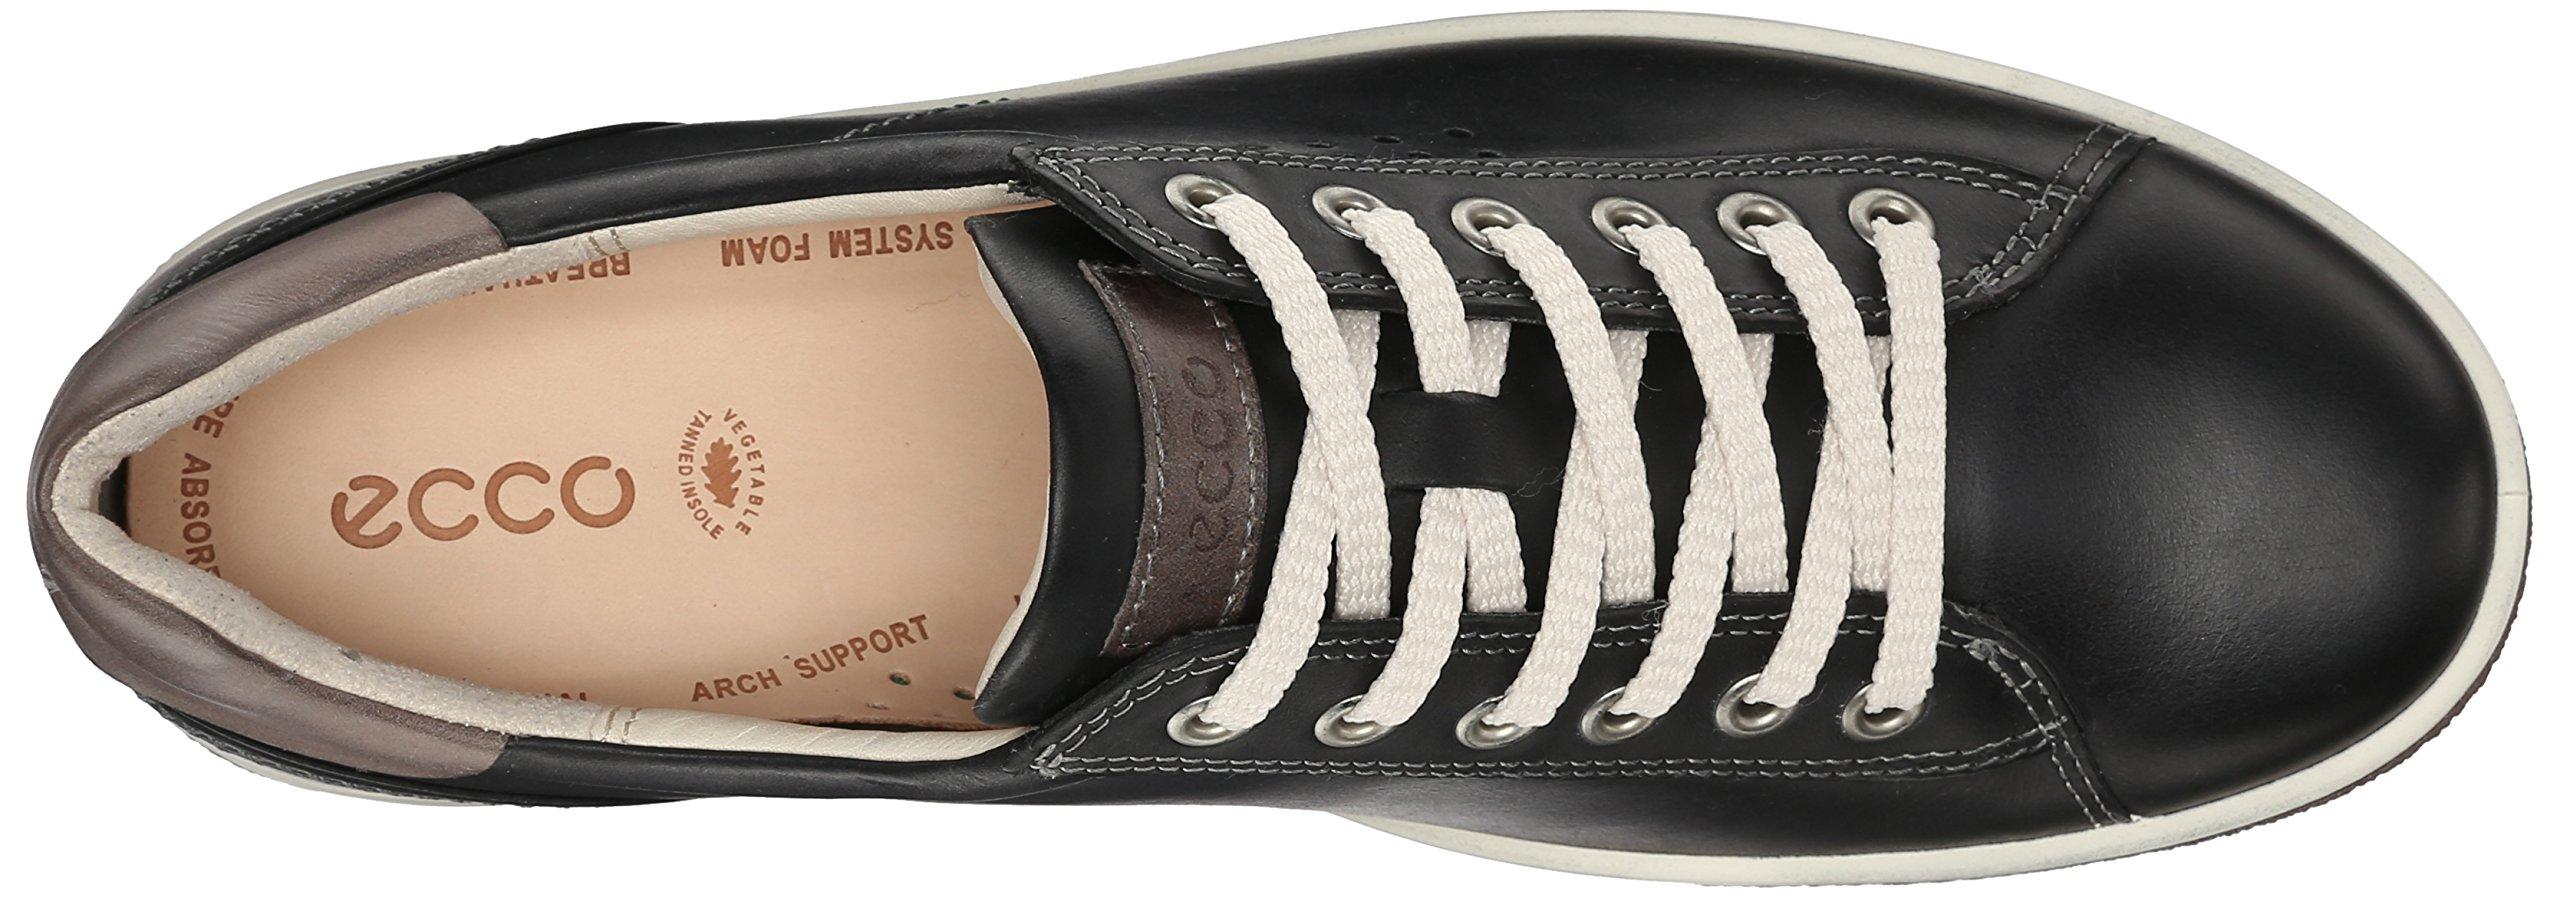 Ecco Footwear Womens Chase II Lace Shoe, Black, 39 EU/8-8.5 M US by ECCO (Image #8)